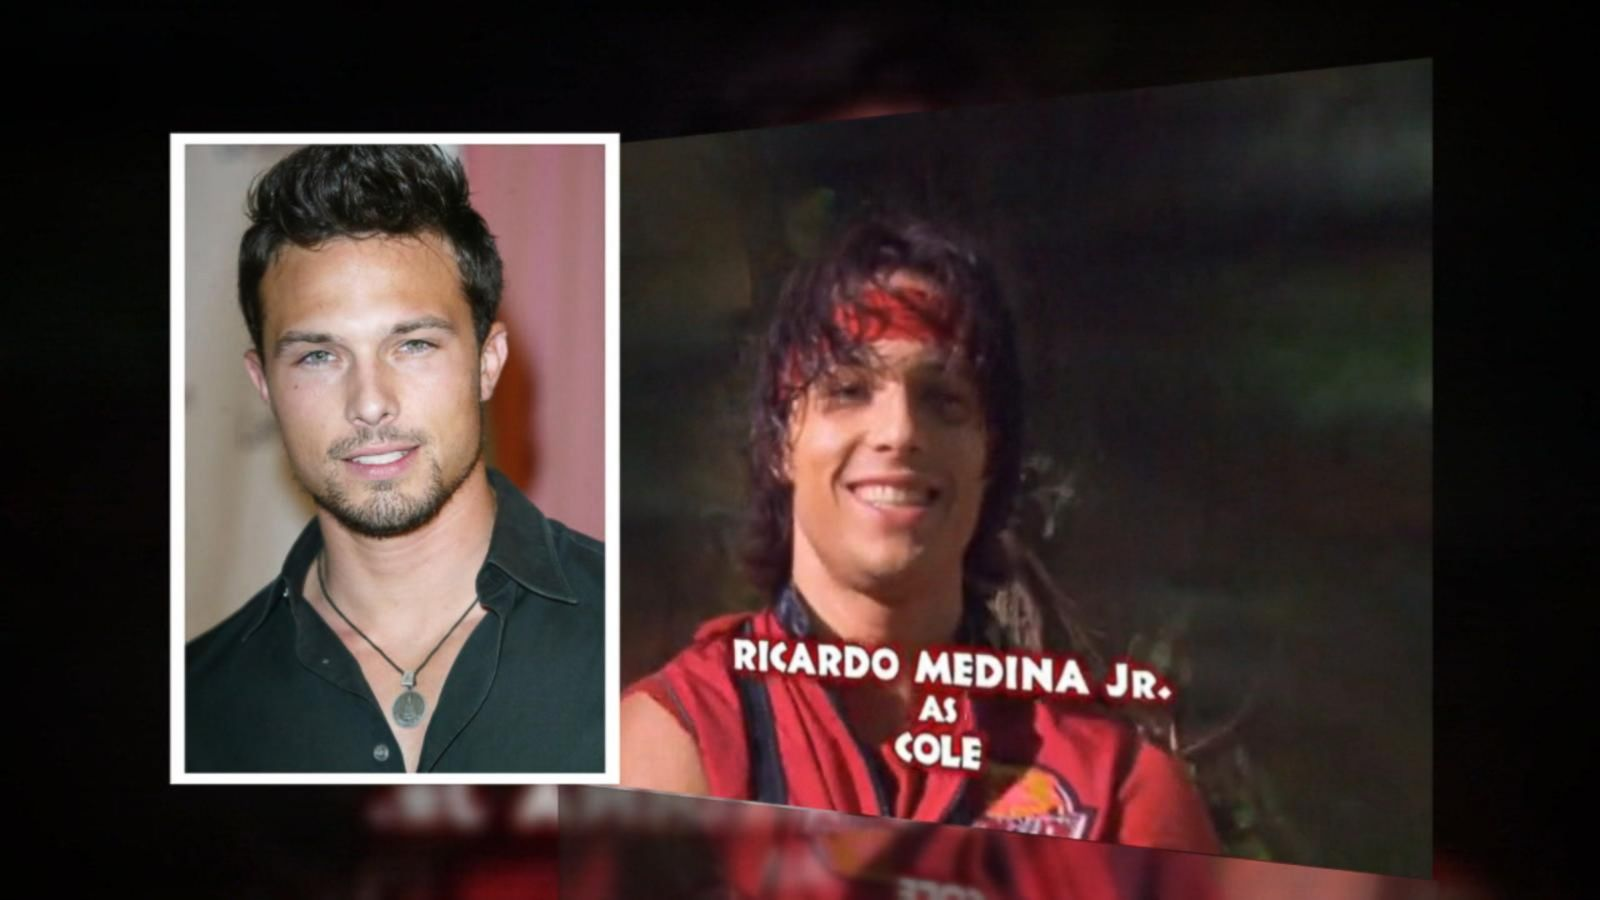 Power Rangers Actor Ricardo Medina Jr To Appear In Court Abc News